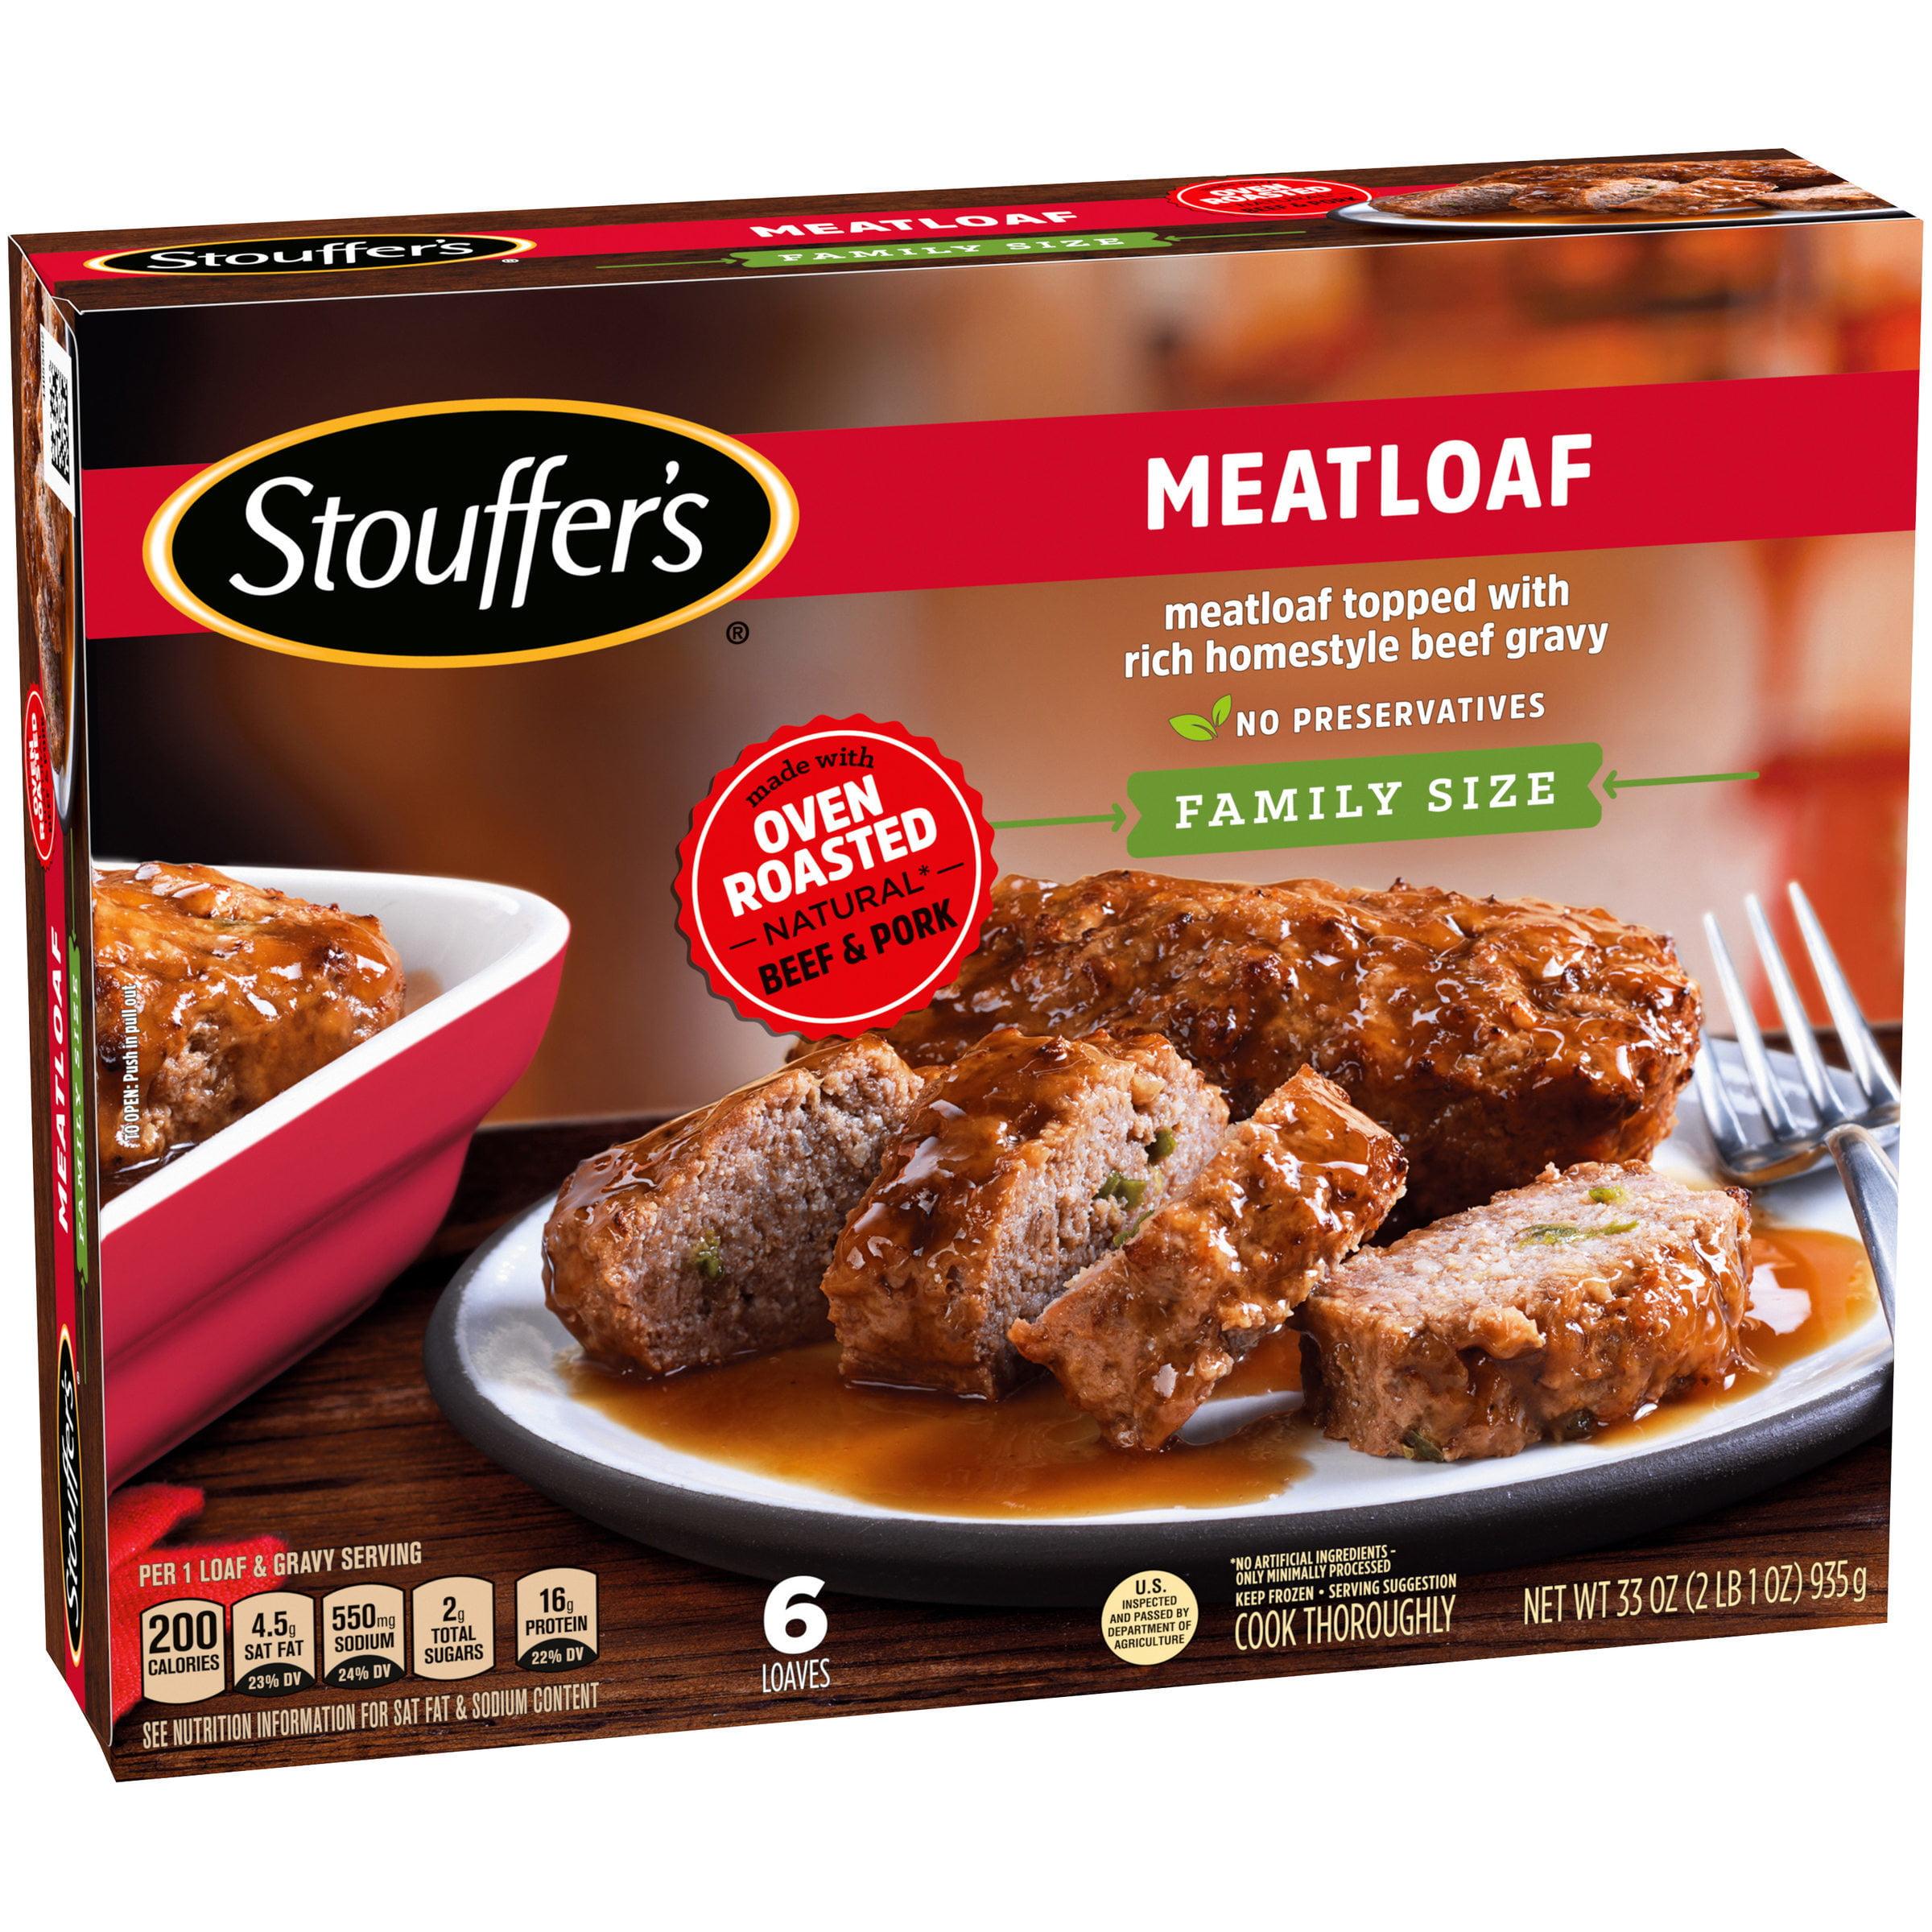 STOUFFER'S Family Size Meatloaf 33 oz. Box - Walmart.com - Walmart.com